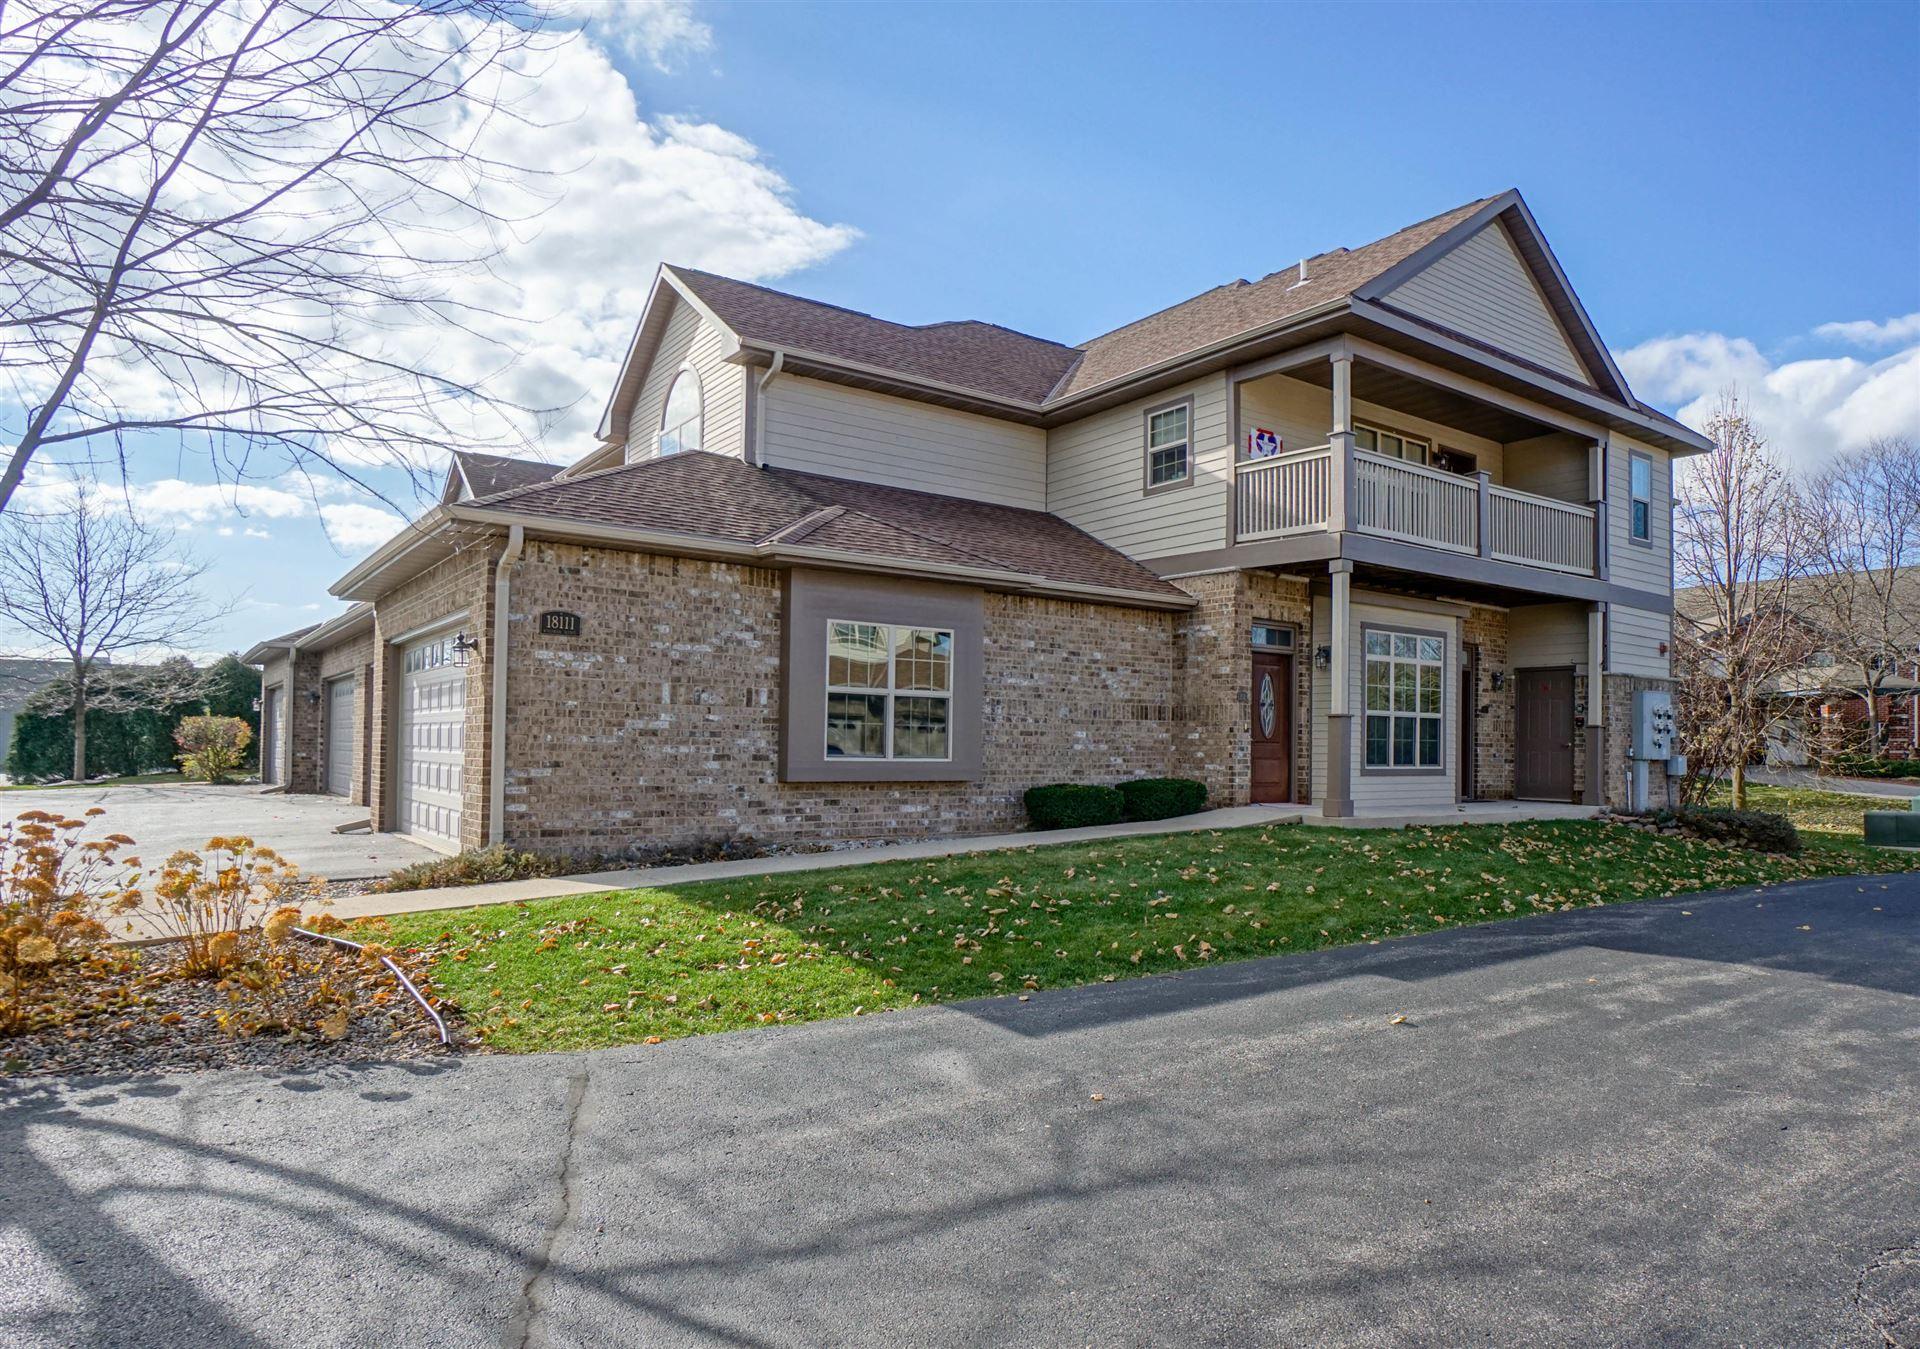 18111 W Wisconsin Ave #102, Brookfield, WI 53045 - #: 1718299